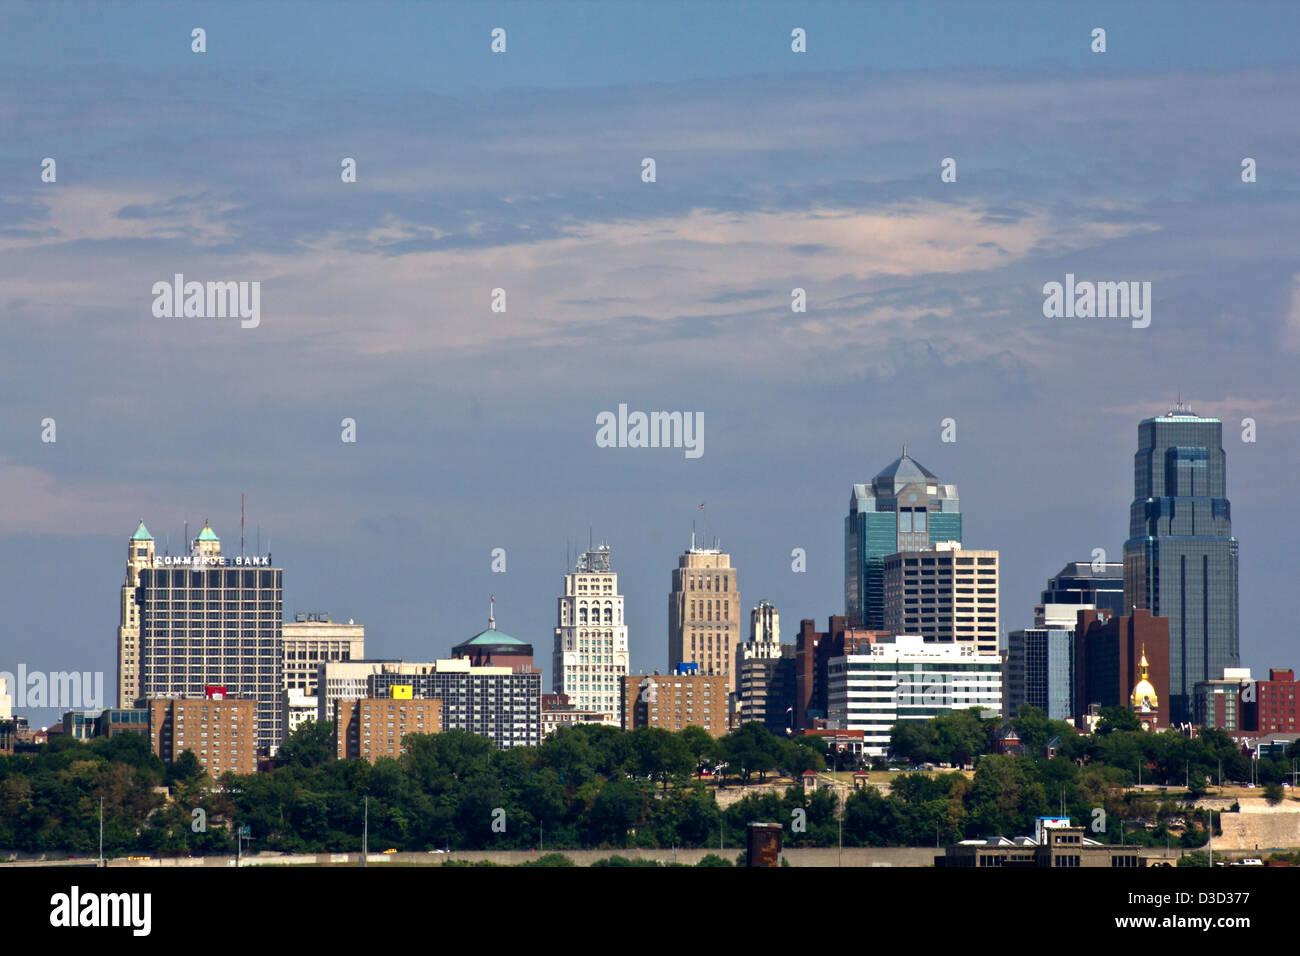 Kansas City MO USA looking eastward Stock Photo: 53763003